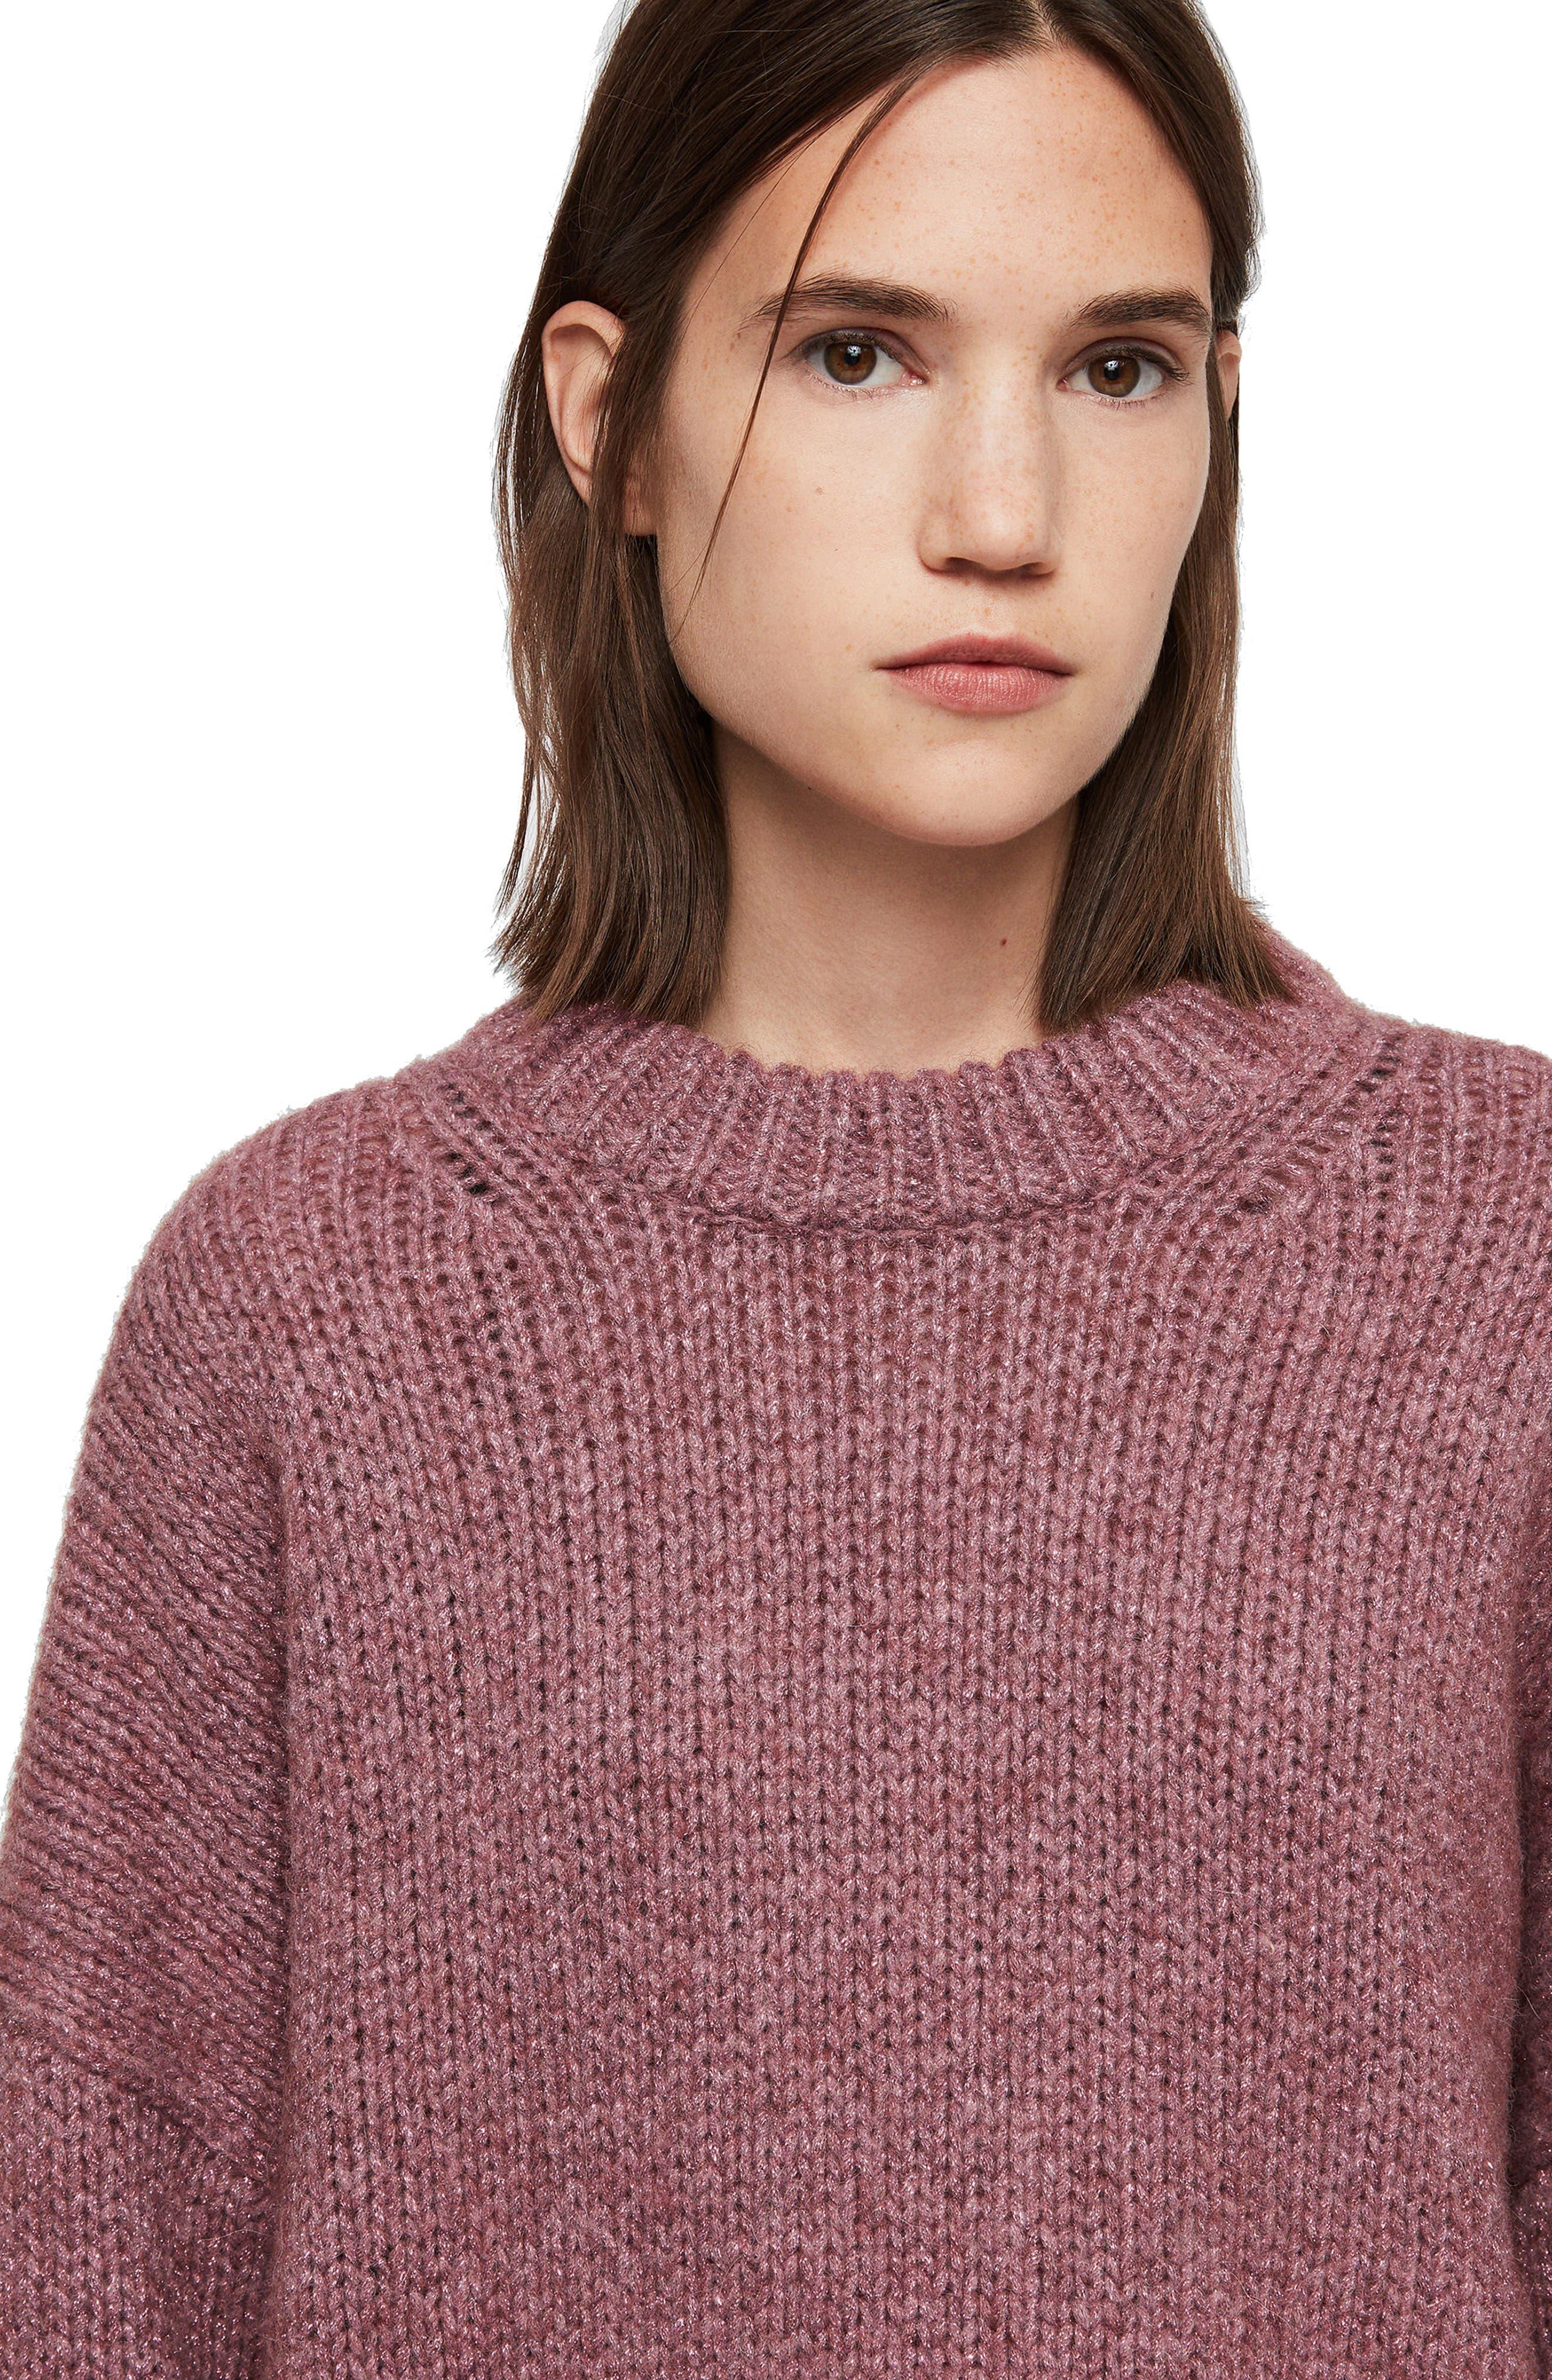 ALLSAINTS, Gemini Metallic Knit Sweater, Alternate thumbnail 5, color, 653